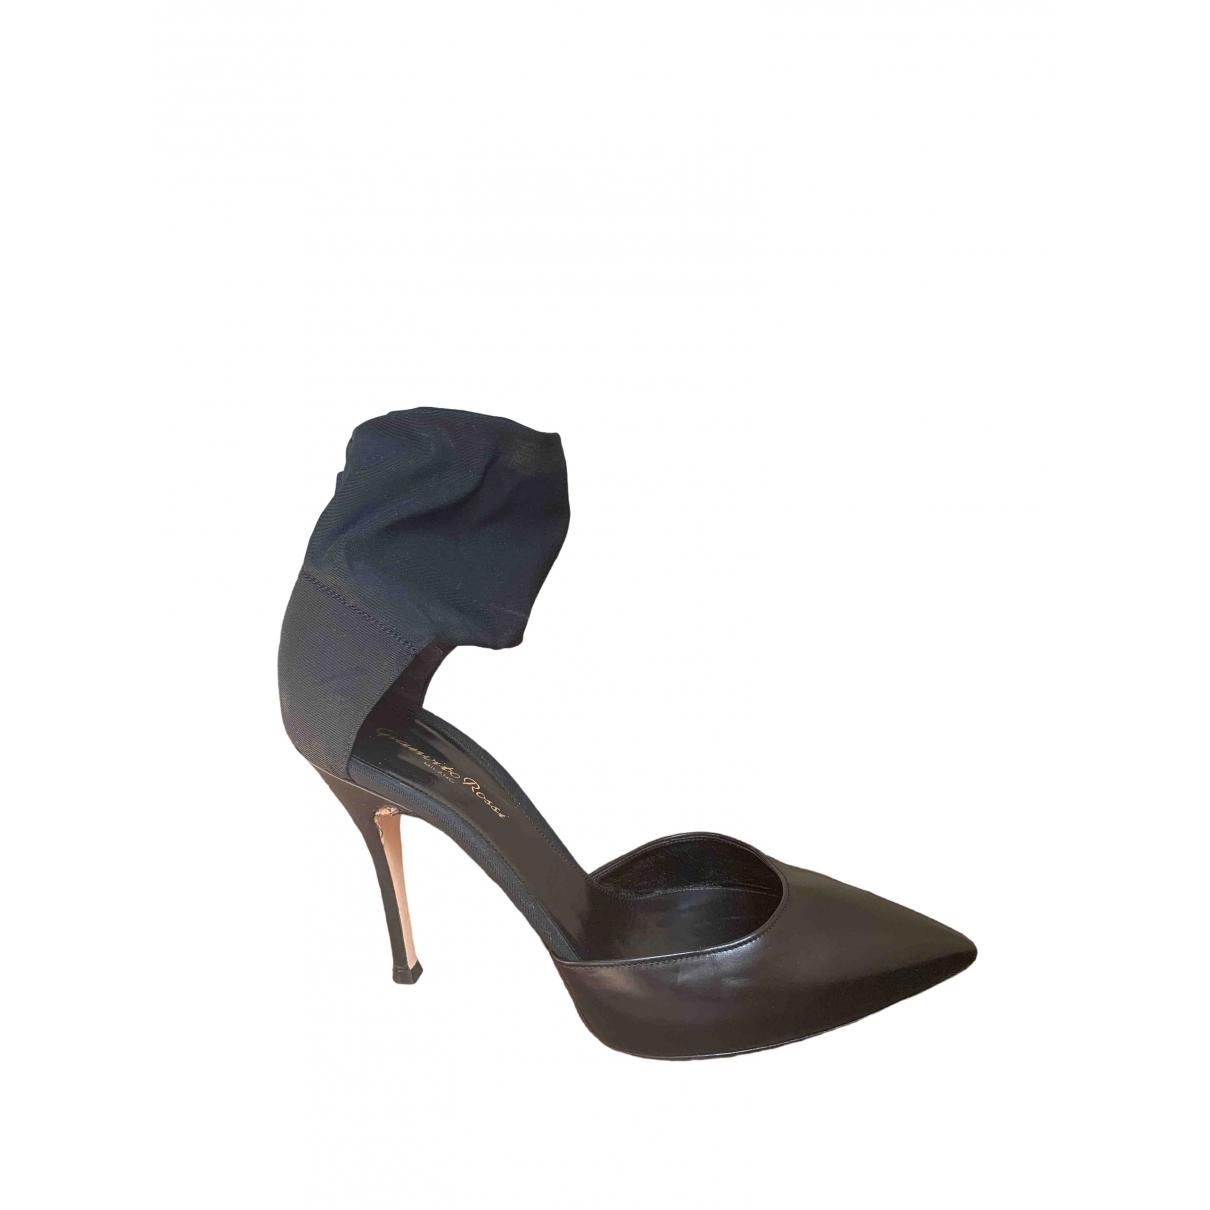 Gianvito Rossi \N Black Leather Heels for Women 39 EU